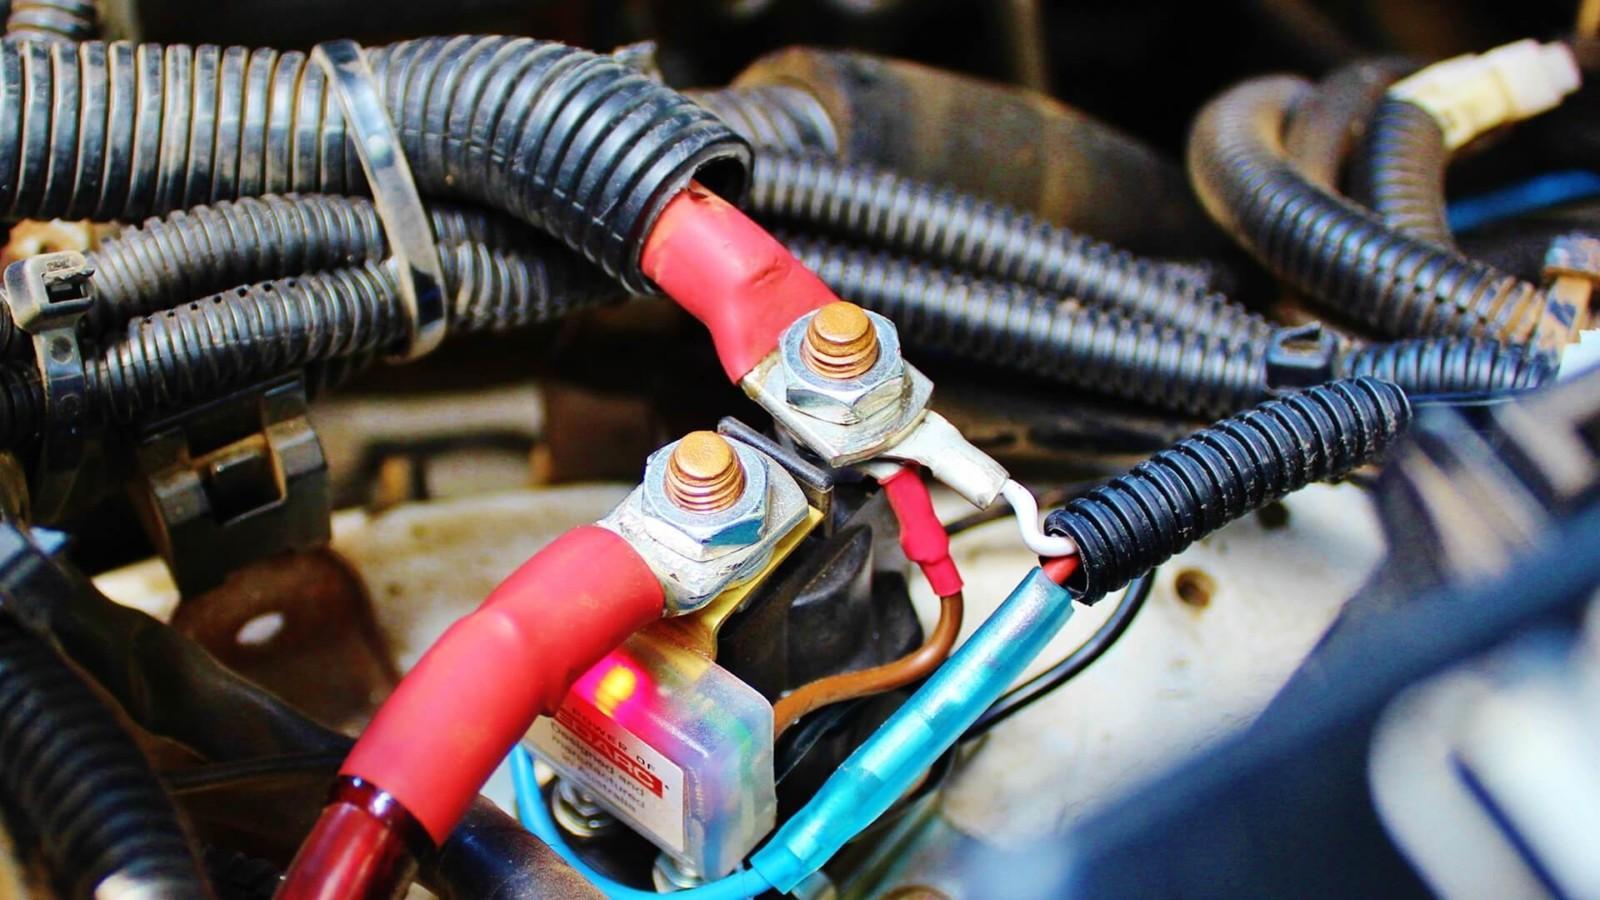 slider auto electrics 1080 Ремонт автоэлектрики